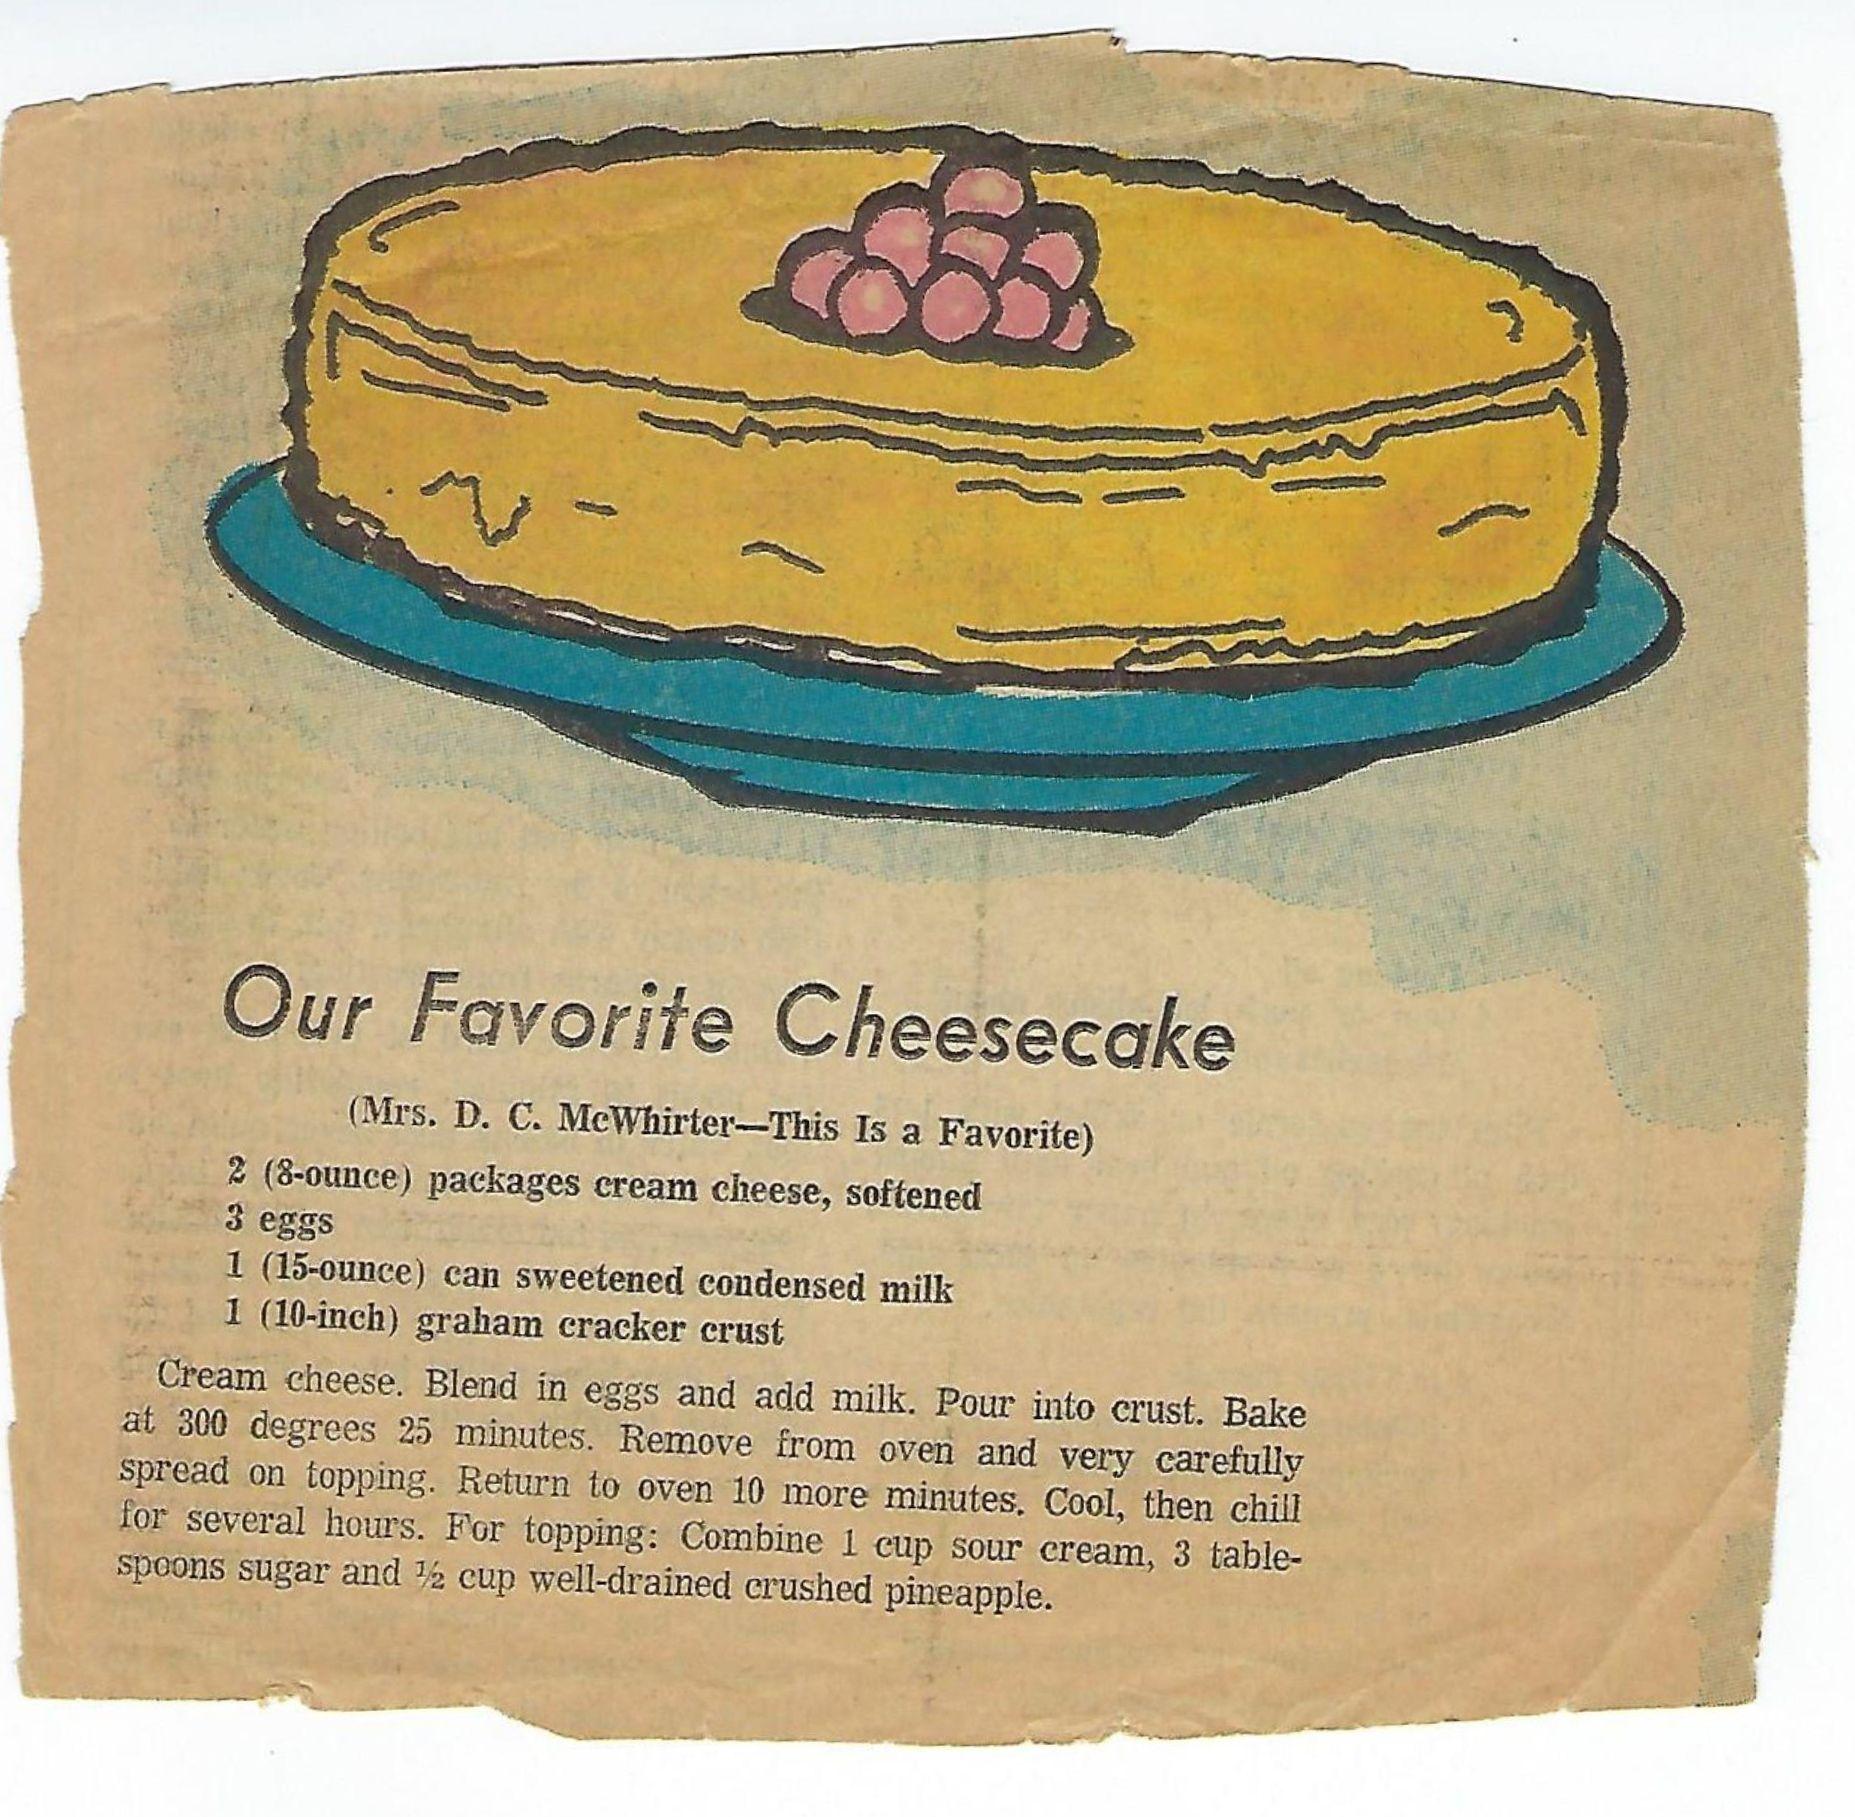 Quick And Easy Cheesecake Recipe Using Cream Cheese Eggs Sweetened Condensed Milk And Graham Cracker Crust In 2020 Quick And Easy Cheesecake Recipe